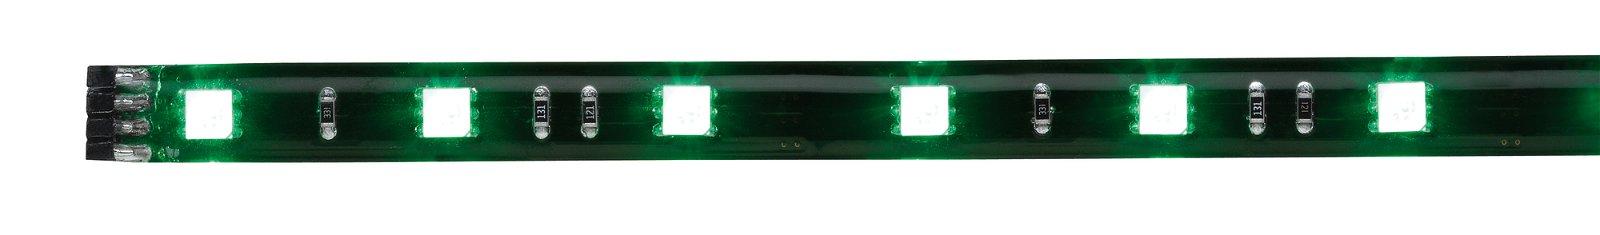 YourLED LED Strip RGB 1m beschichtet IP44 7W 188lm/m RGB